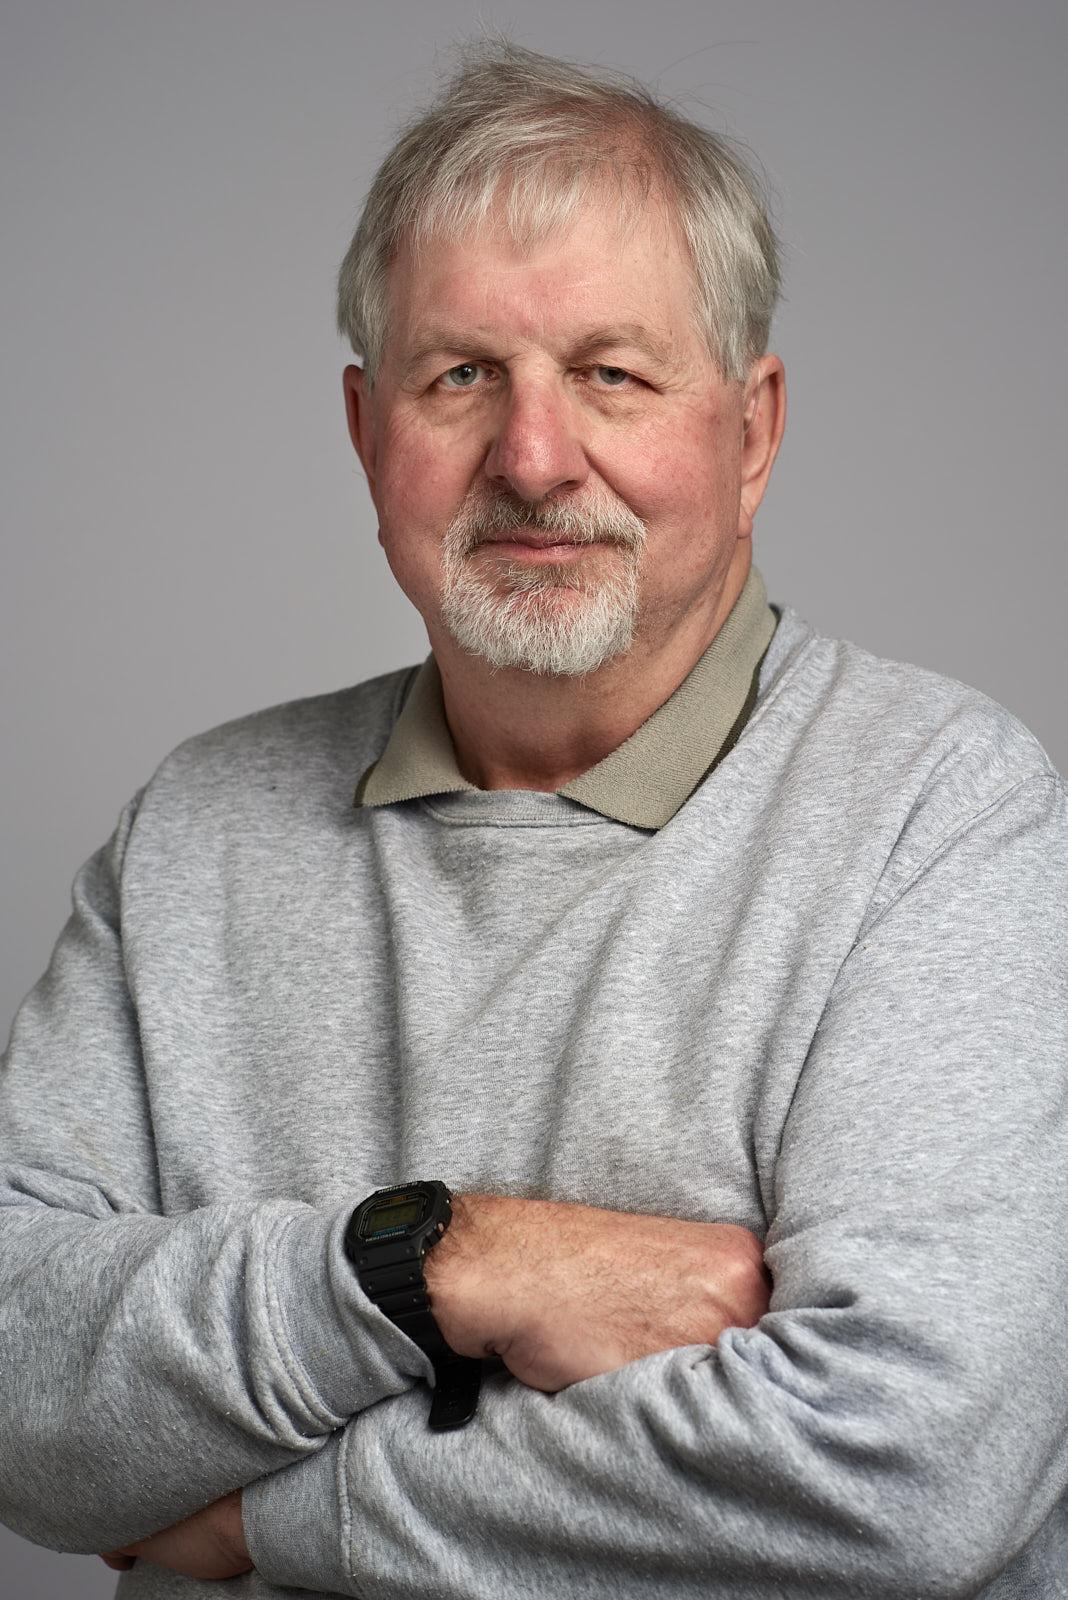 Bob: President Upper Yarra Valley U3A, Secretary Millgrove Resident's Action Group, Branch Member ALP, British Public Service 1967-1970, Australia Post 1980-2012.